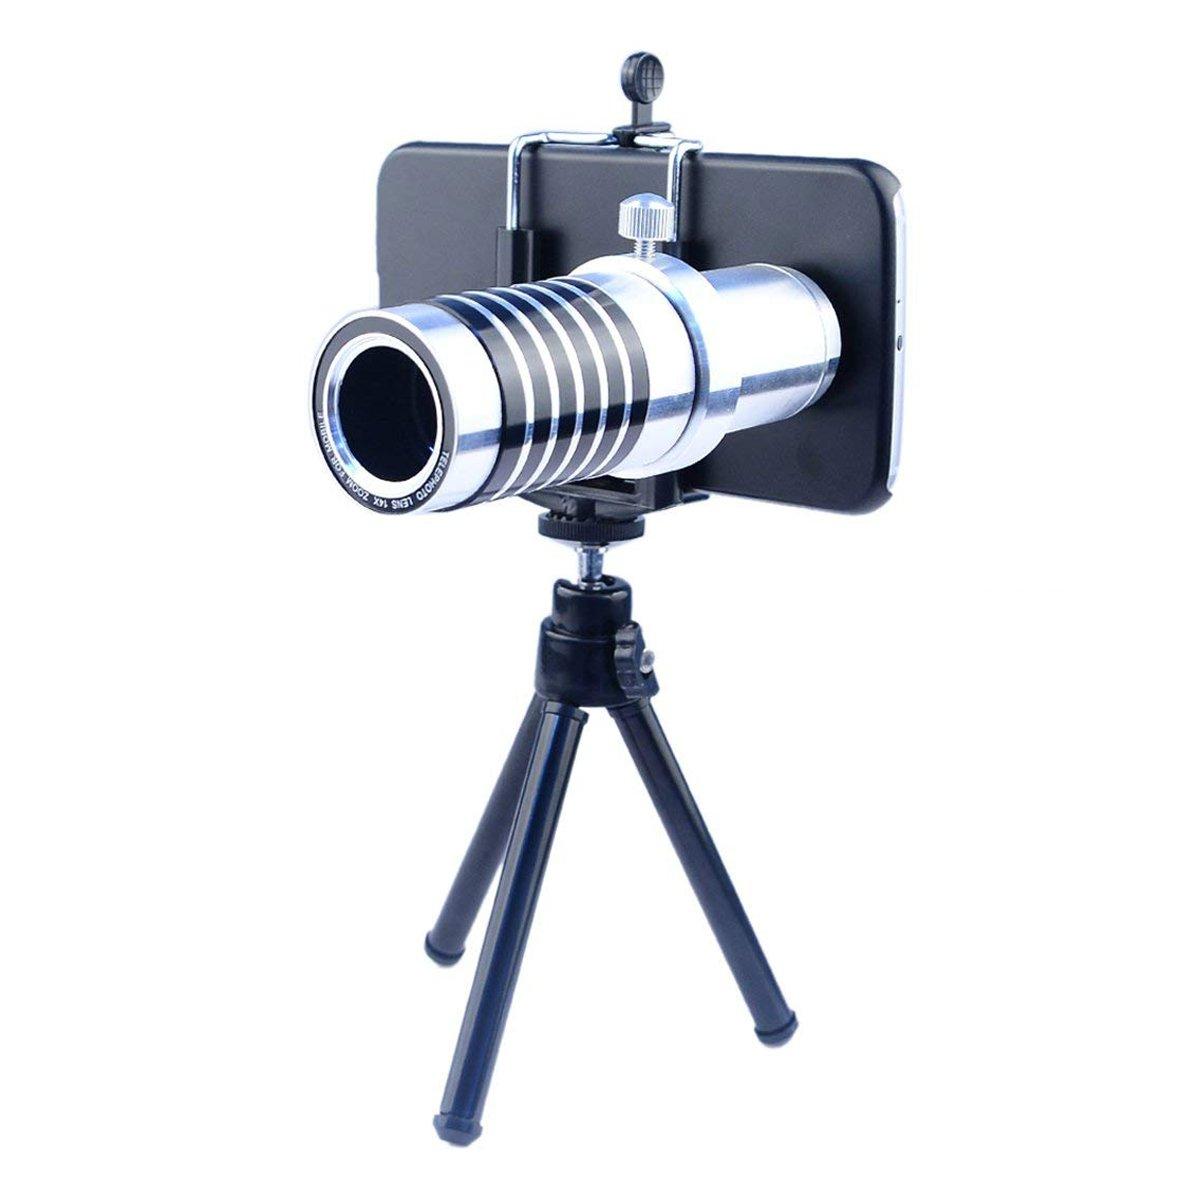 Nanle Camera Phone Lens Kit Including 14x Manual Focus Telephoto Lens/Fisheye Lens/Wide Angle Lens/Macro Lens